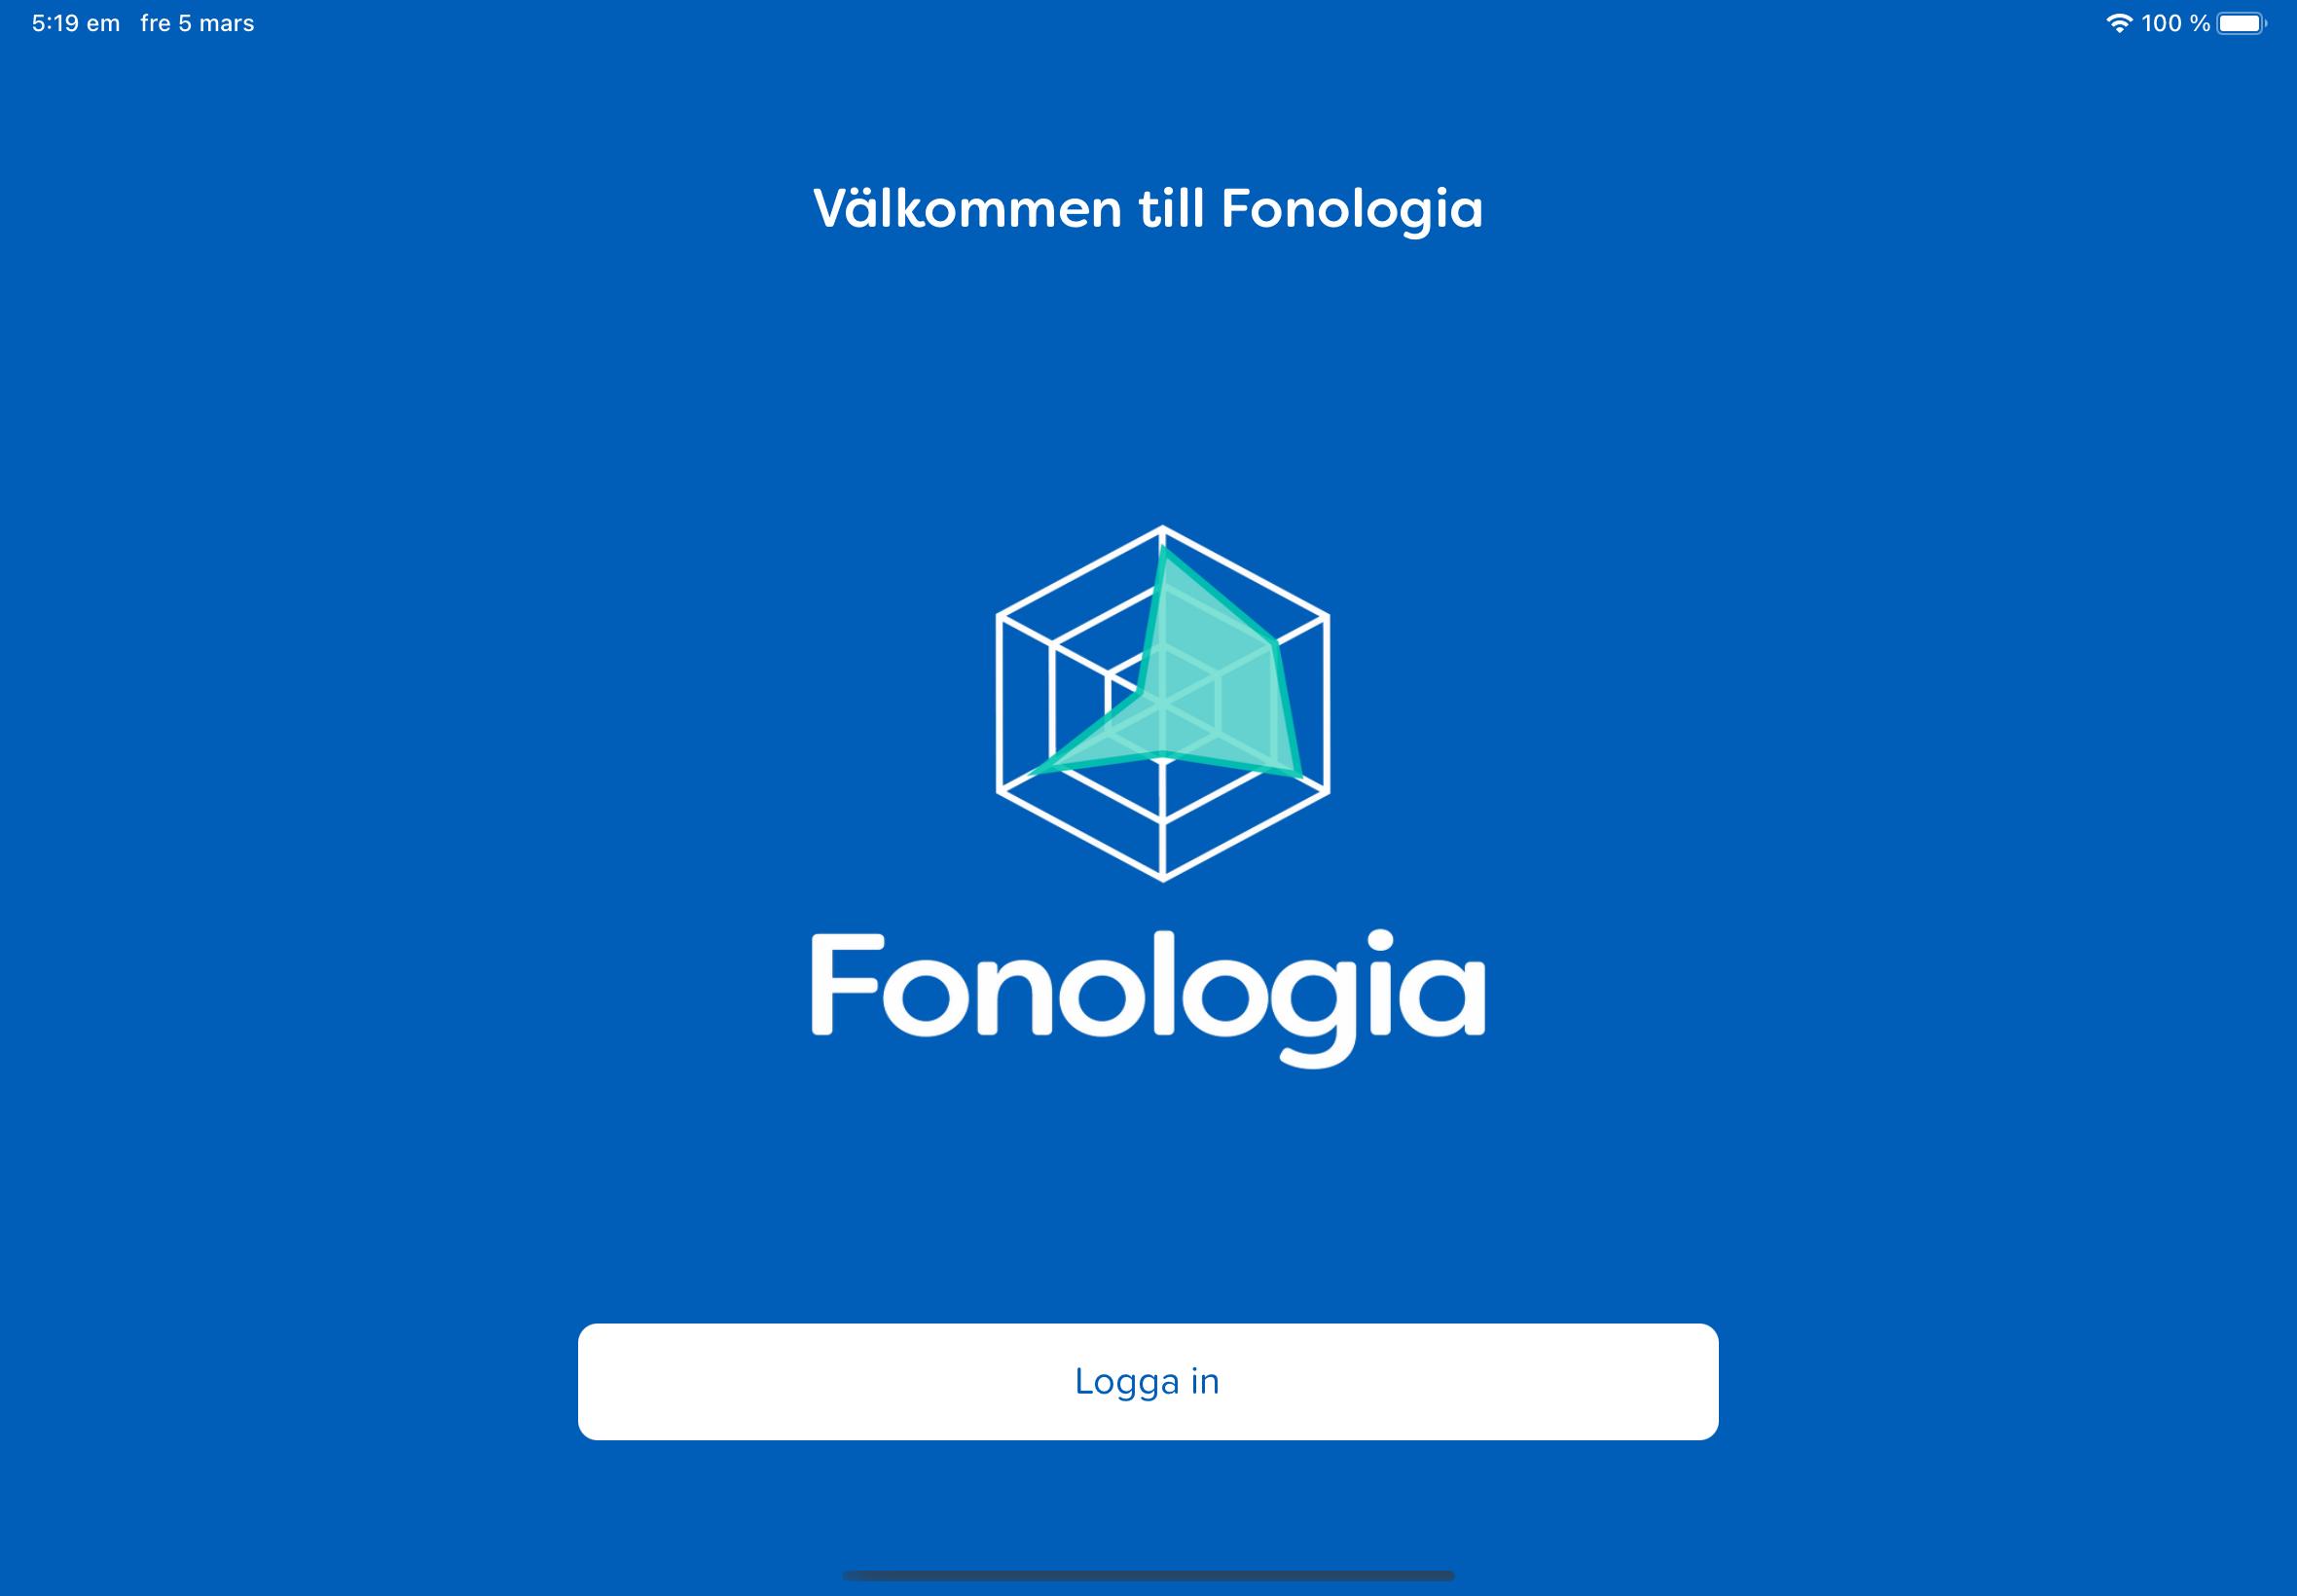 Fonologia case study